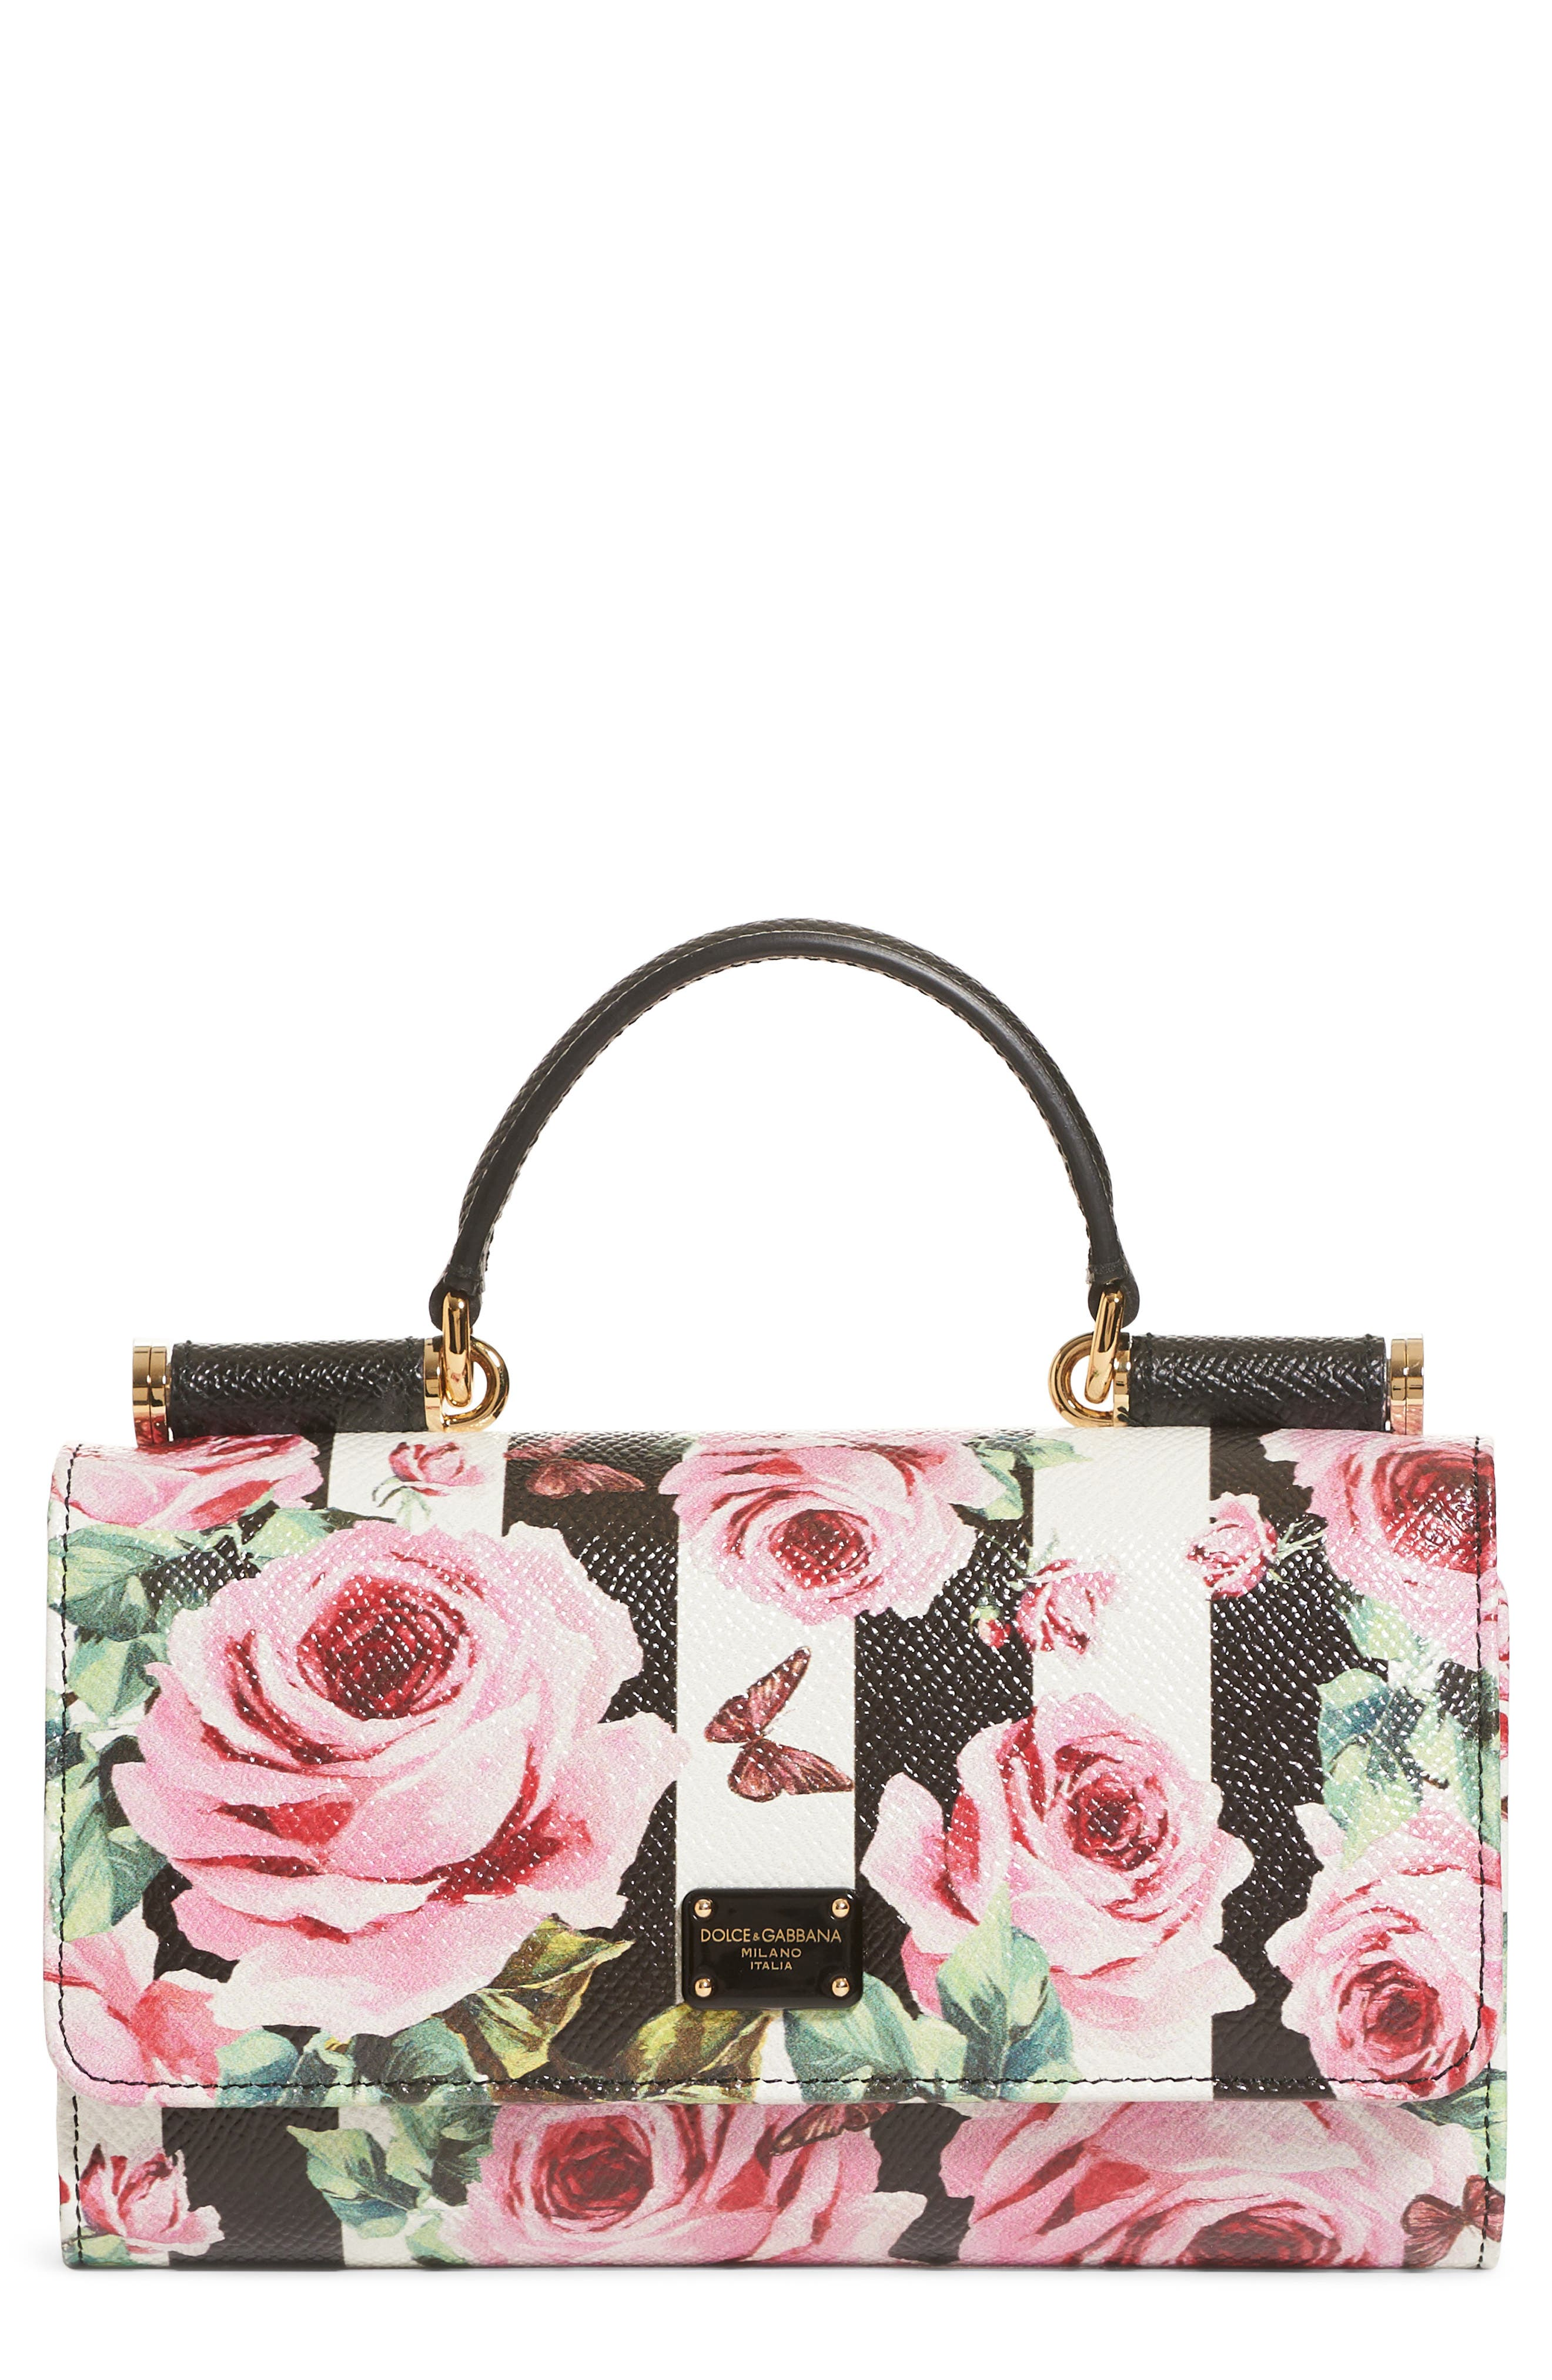 Mini Stripe Floral Calfskin Leather Bag,                             Main thumbnail 1, color,                             Rose/ White/ Nero